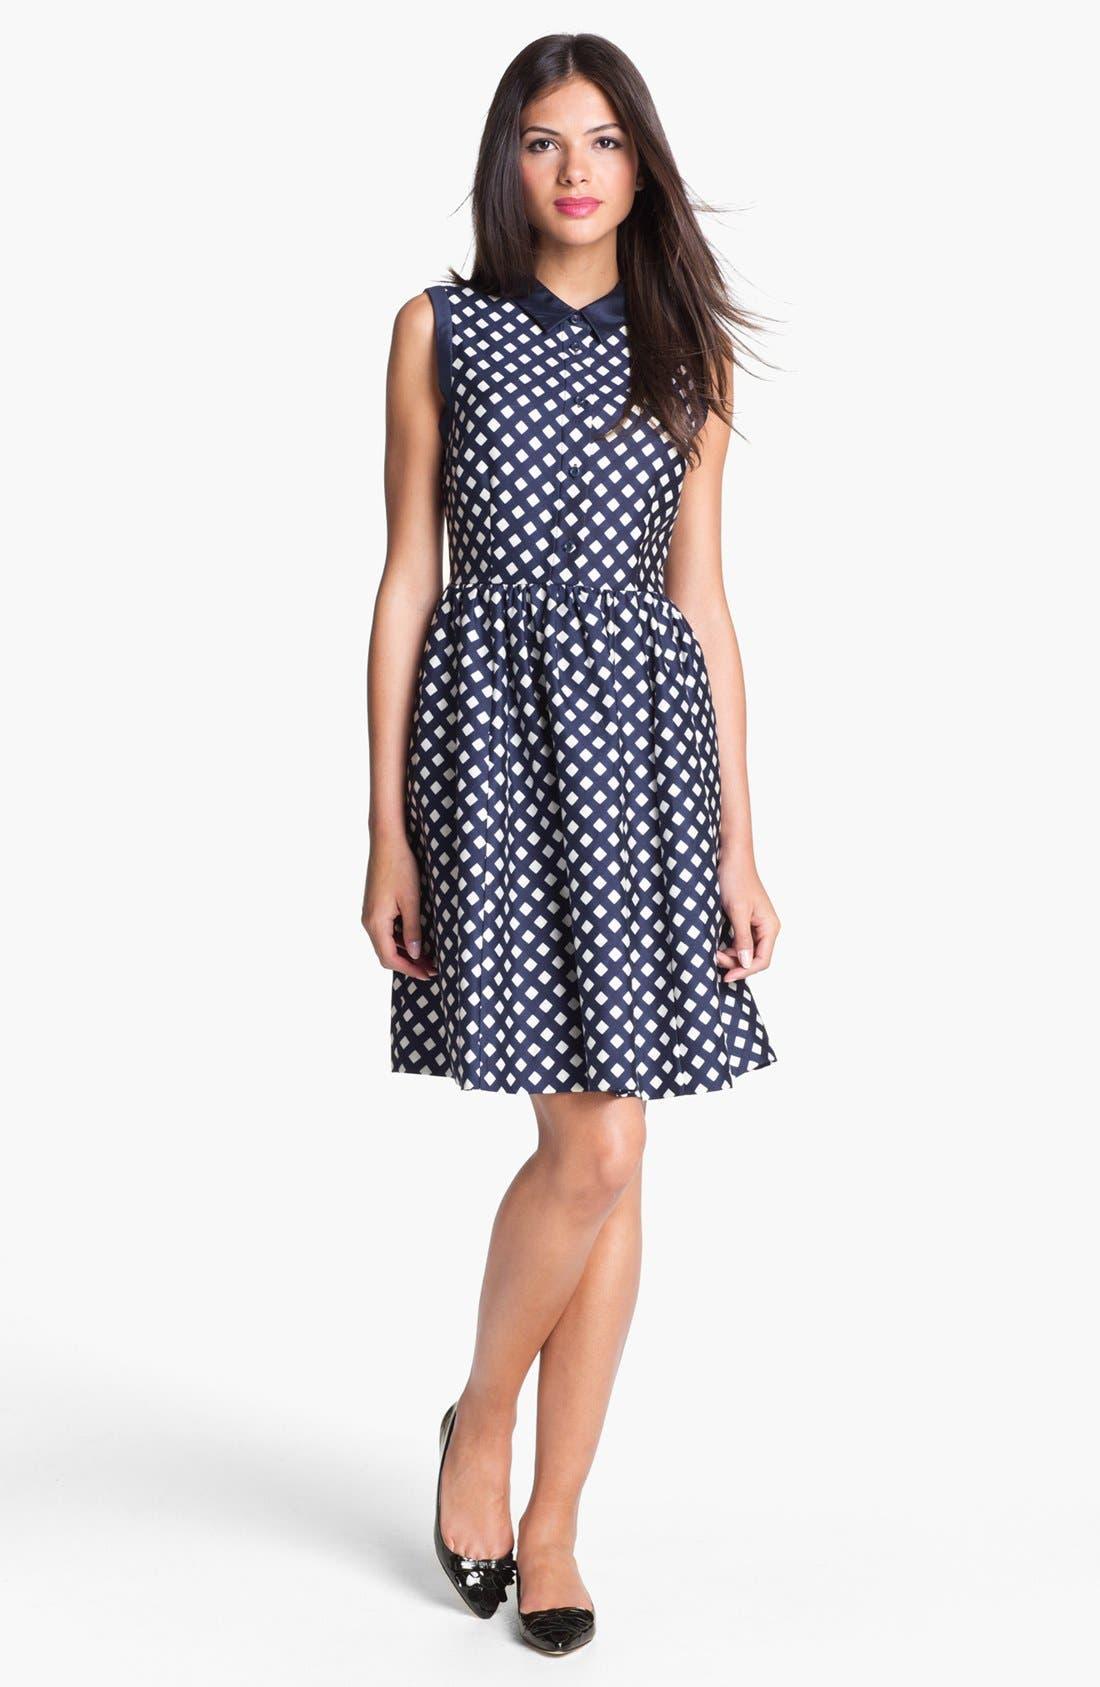 Main Image - kate spade new york 'addison' cotton blend fit & flare dress